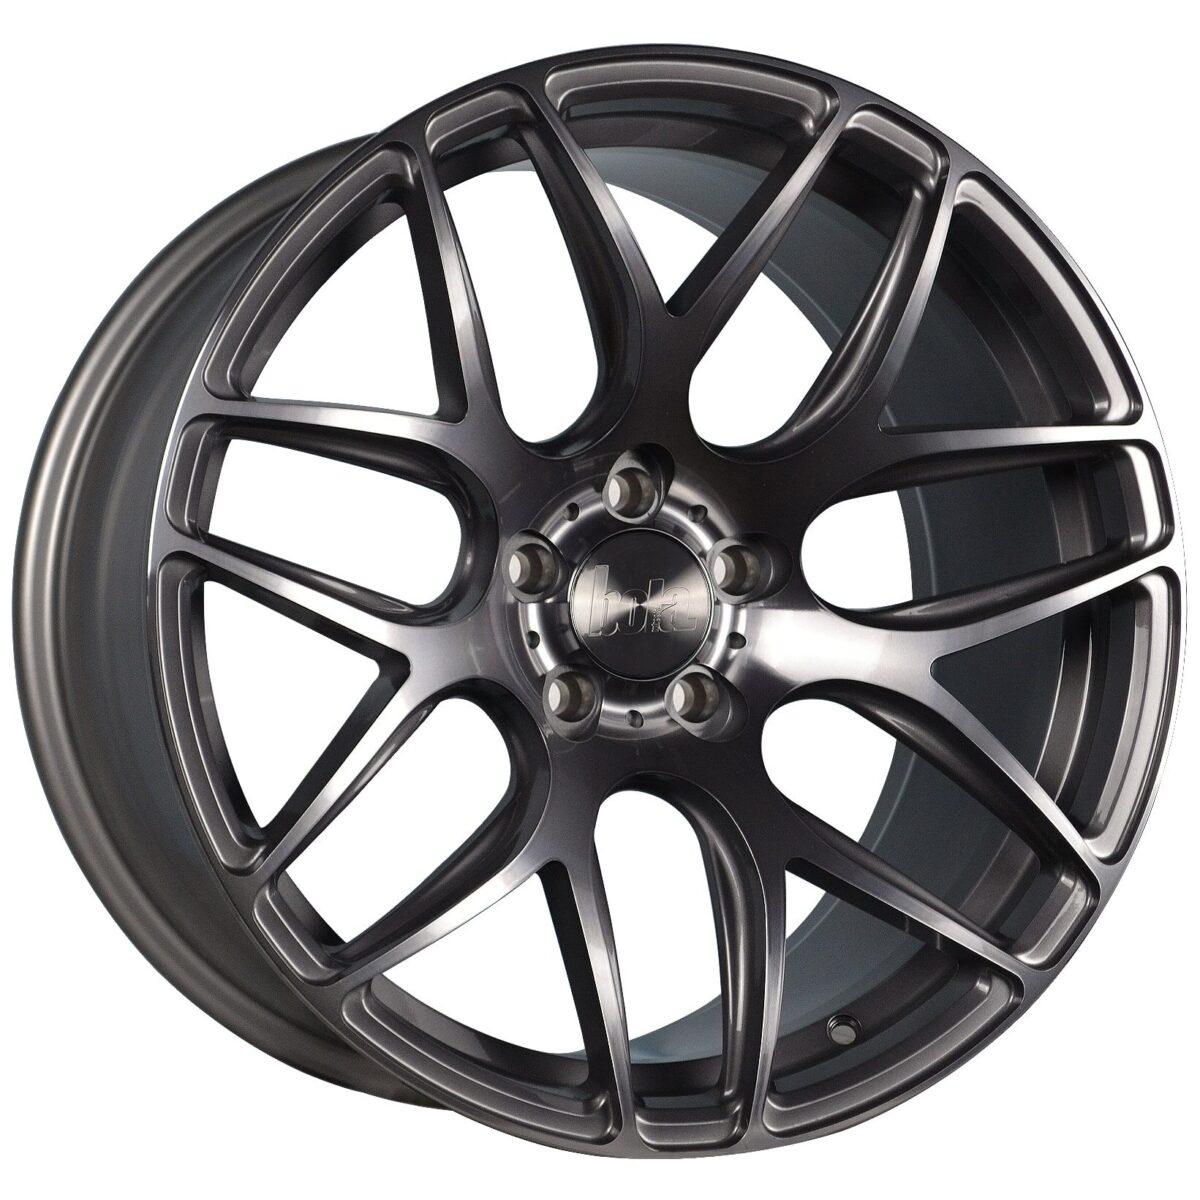 "18"" BOLA B8R Wheels - Gloss Titanium - All BMW Models"